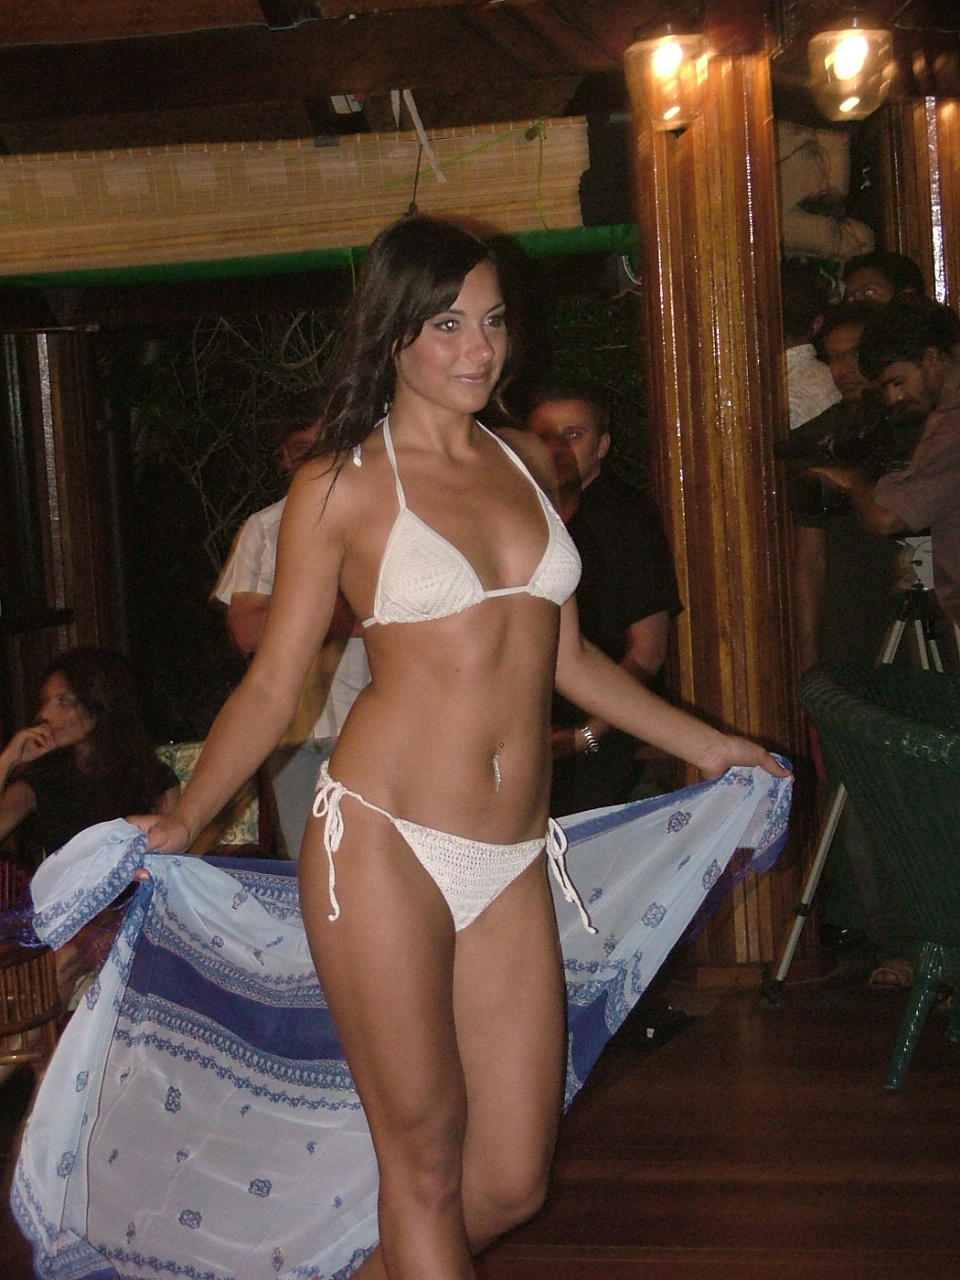 nature characters humanoids melvin show model woman beachwear bikini underwear front catwalk mode sarong press walking